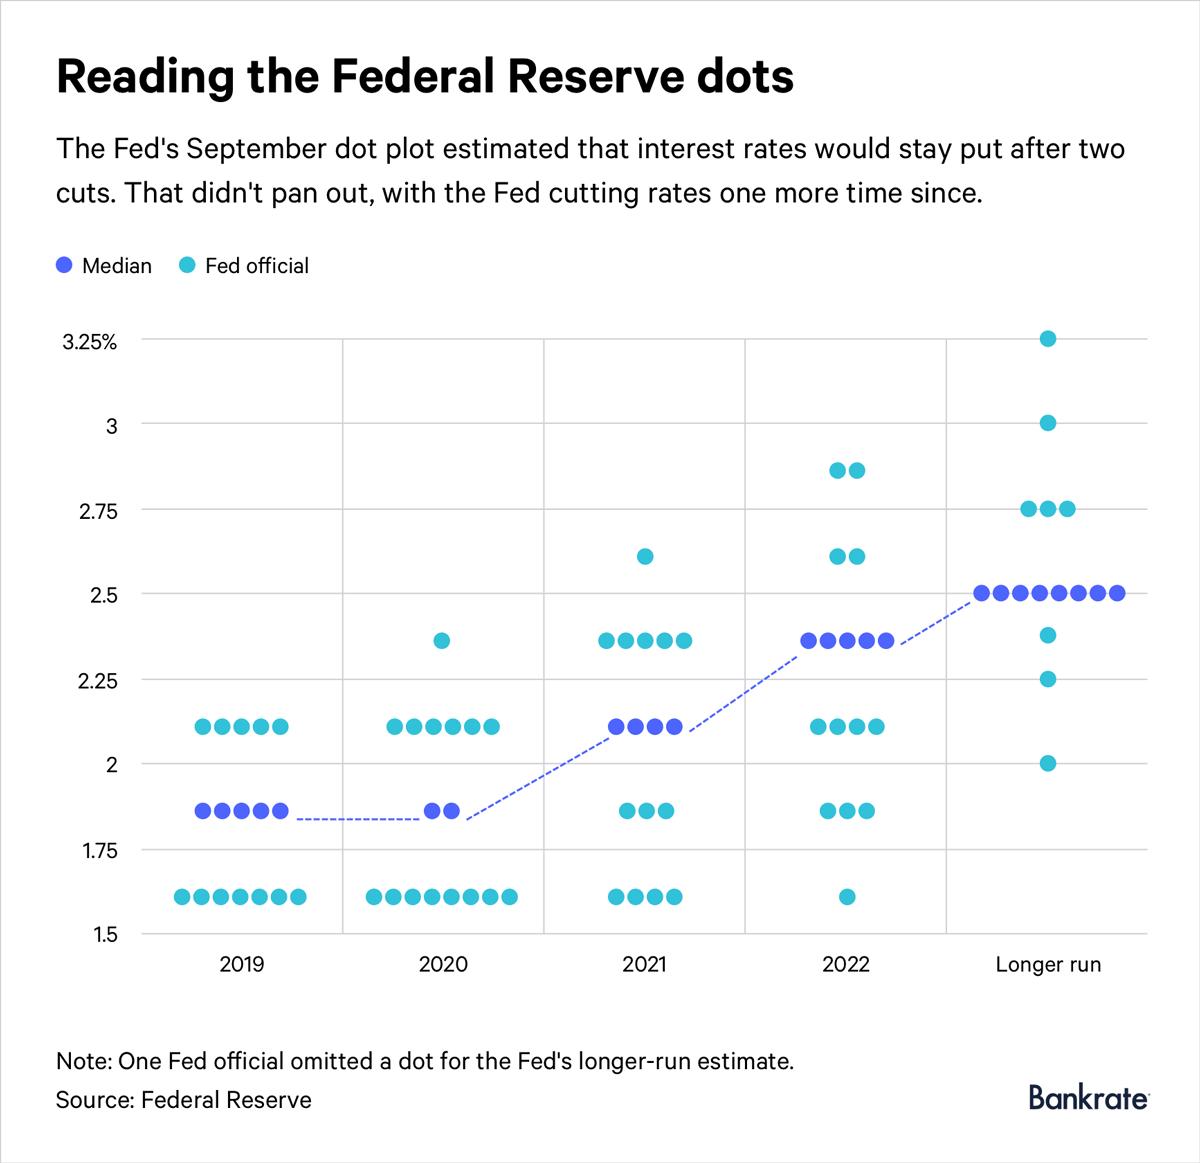 Federal Reserve's dot plot